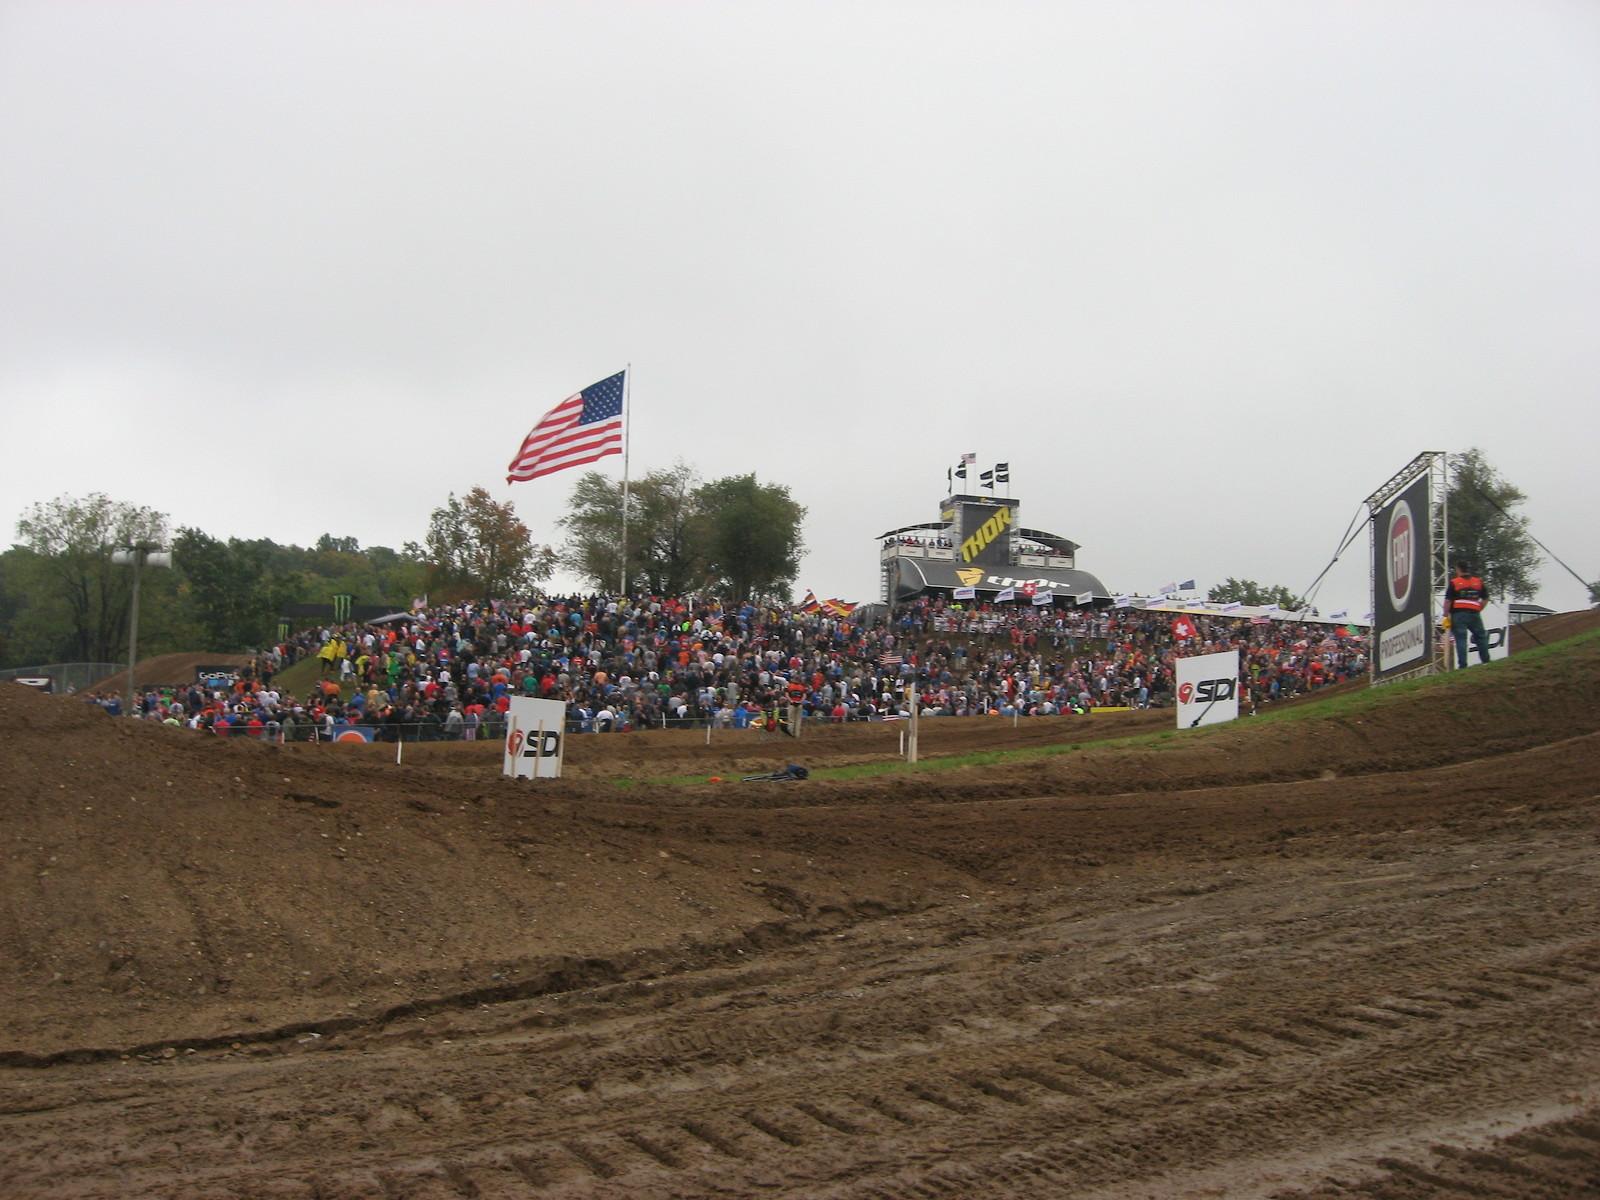 MXCLWN00014 - motoclown - Motocross Pictures - Vital MX